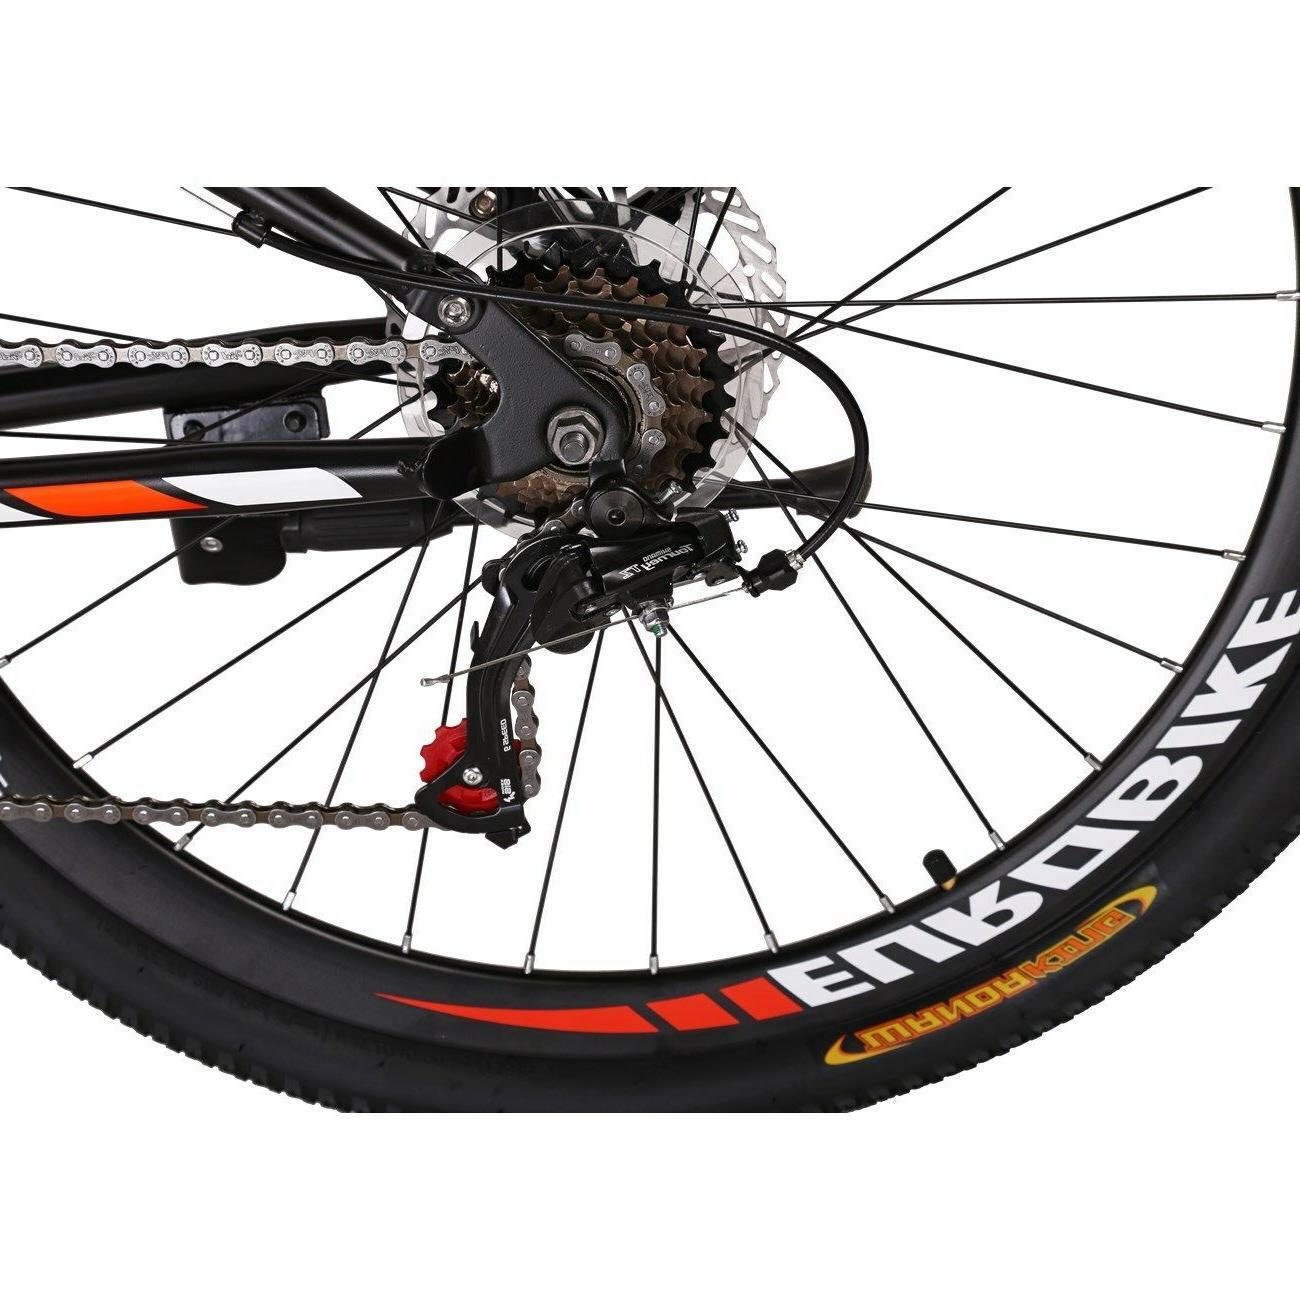 "27.5"" Suspension Mountain Bike Shimano Mens MTB"